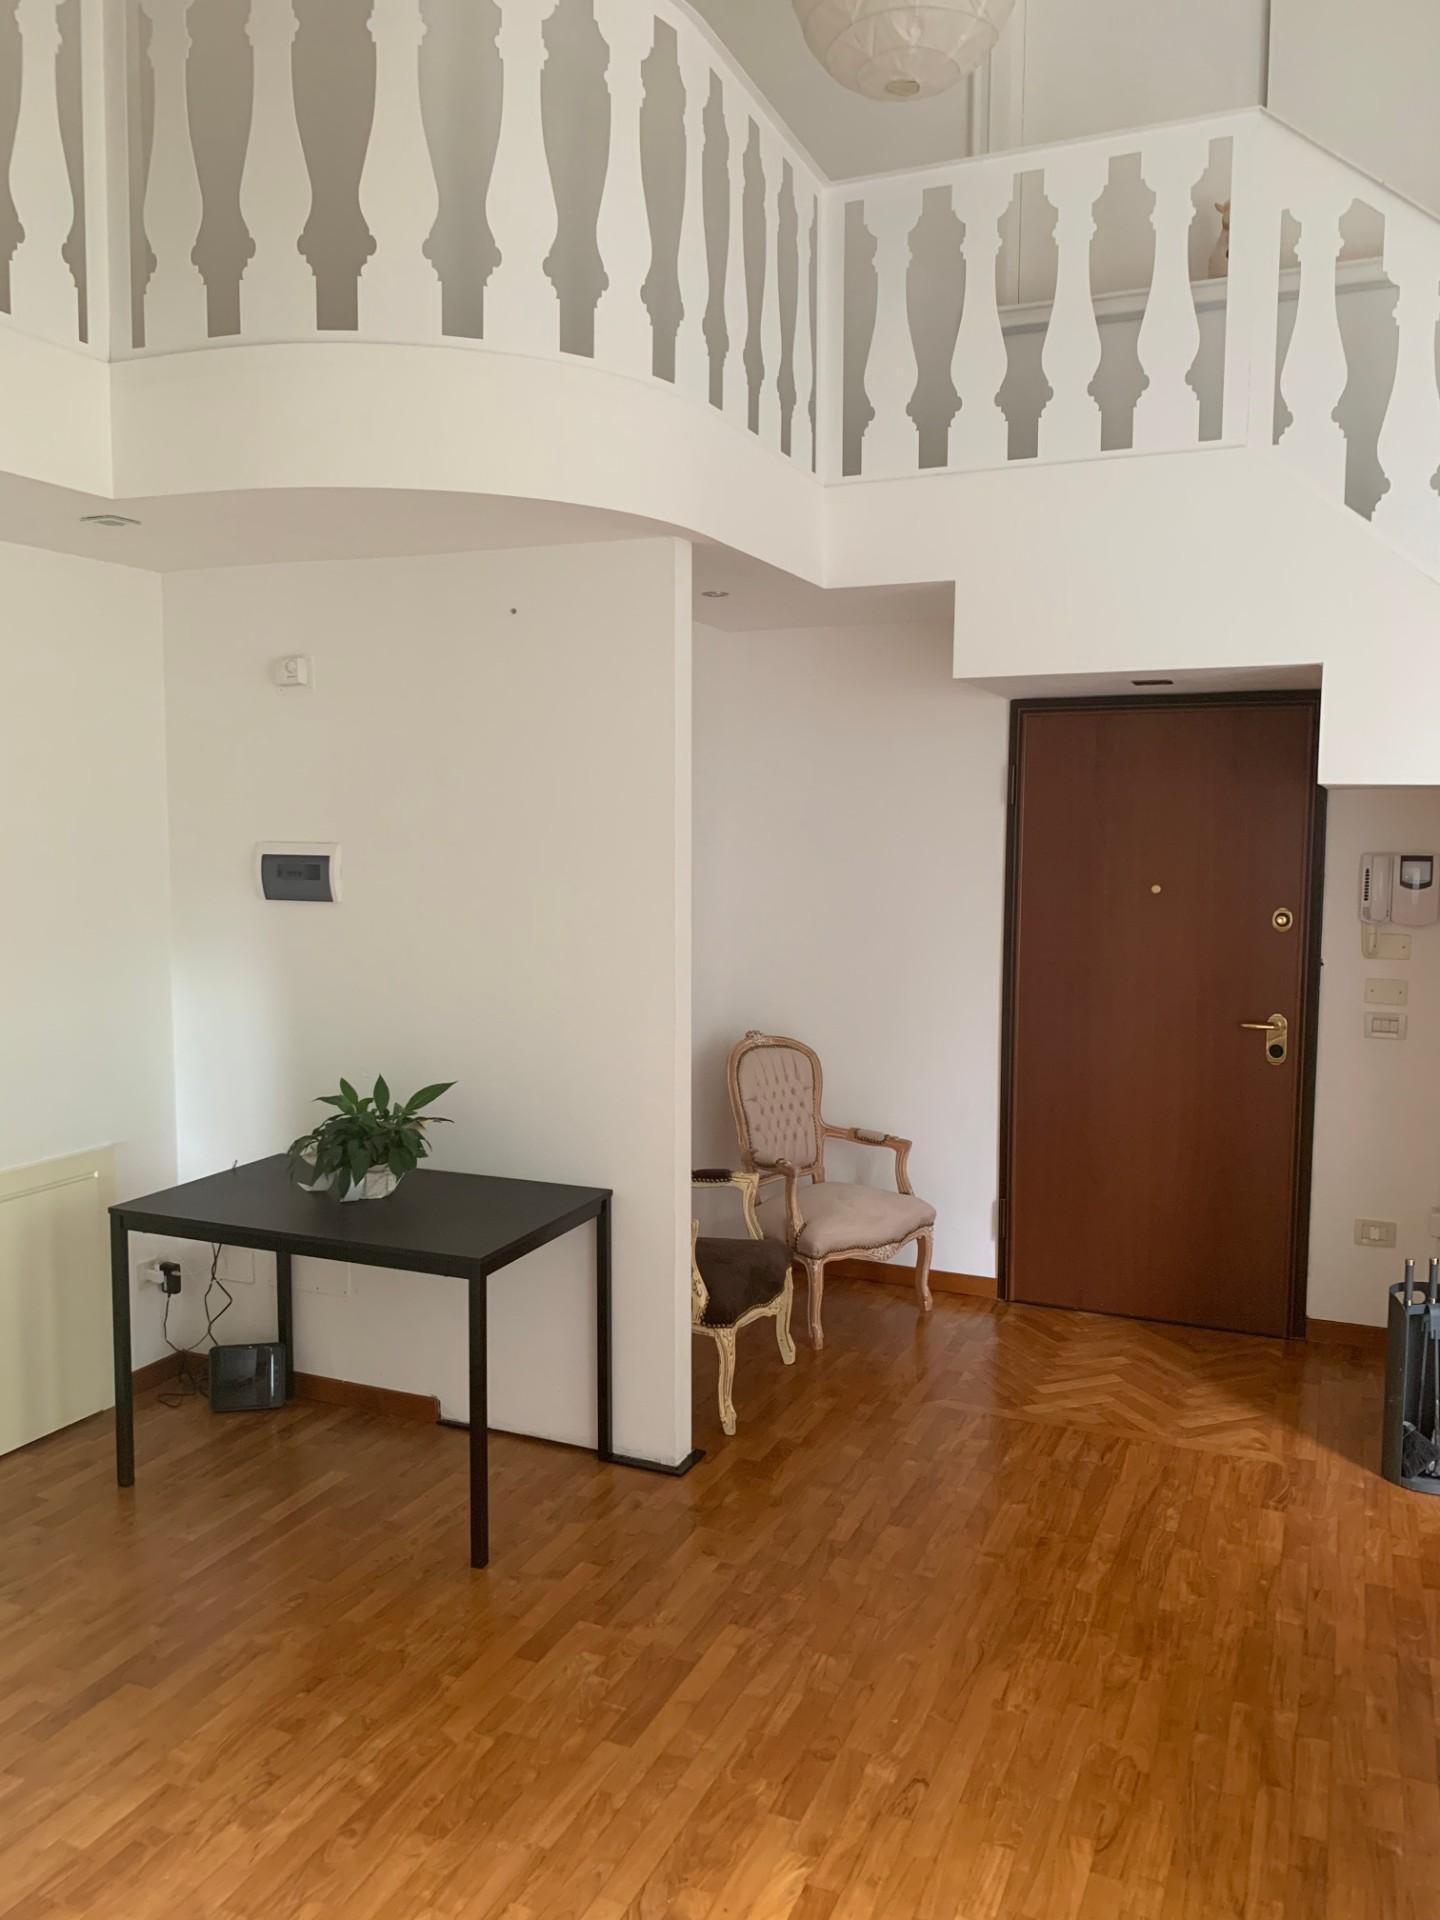 Appartamento in vendita a La Bianca, Pontedera (PI)